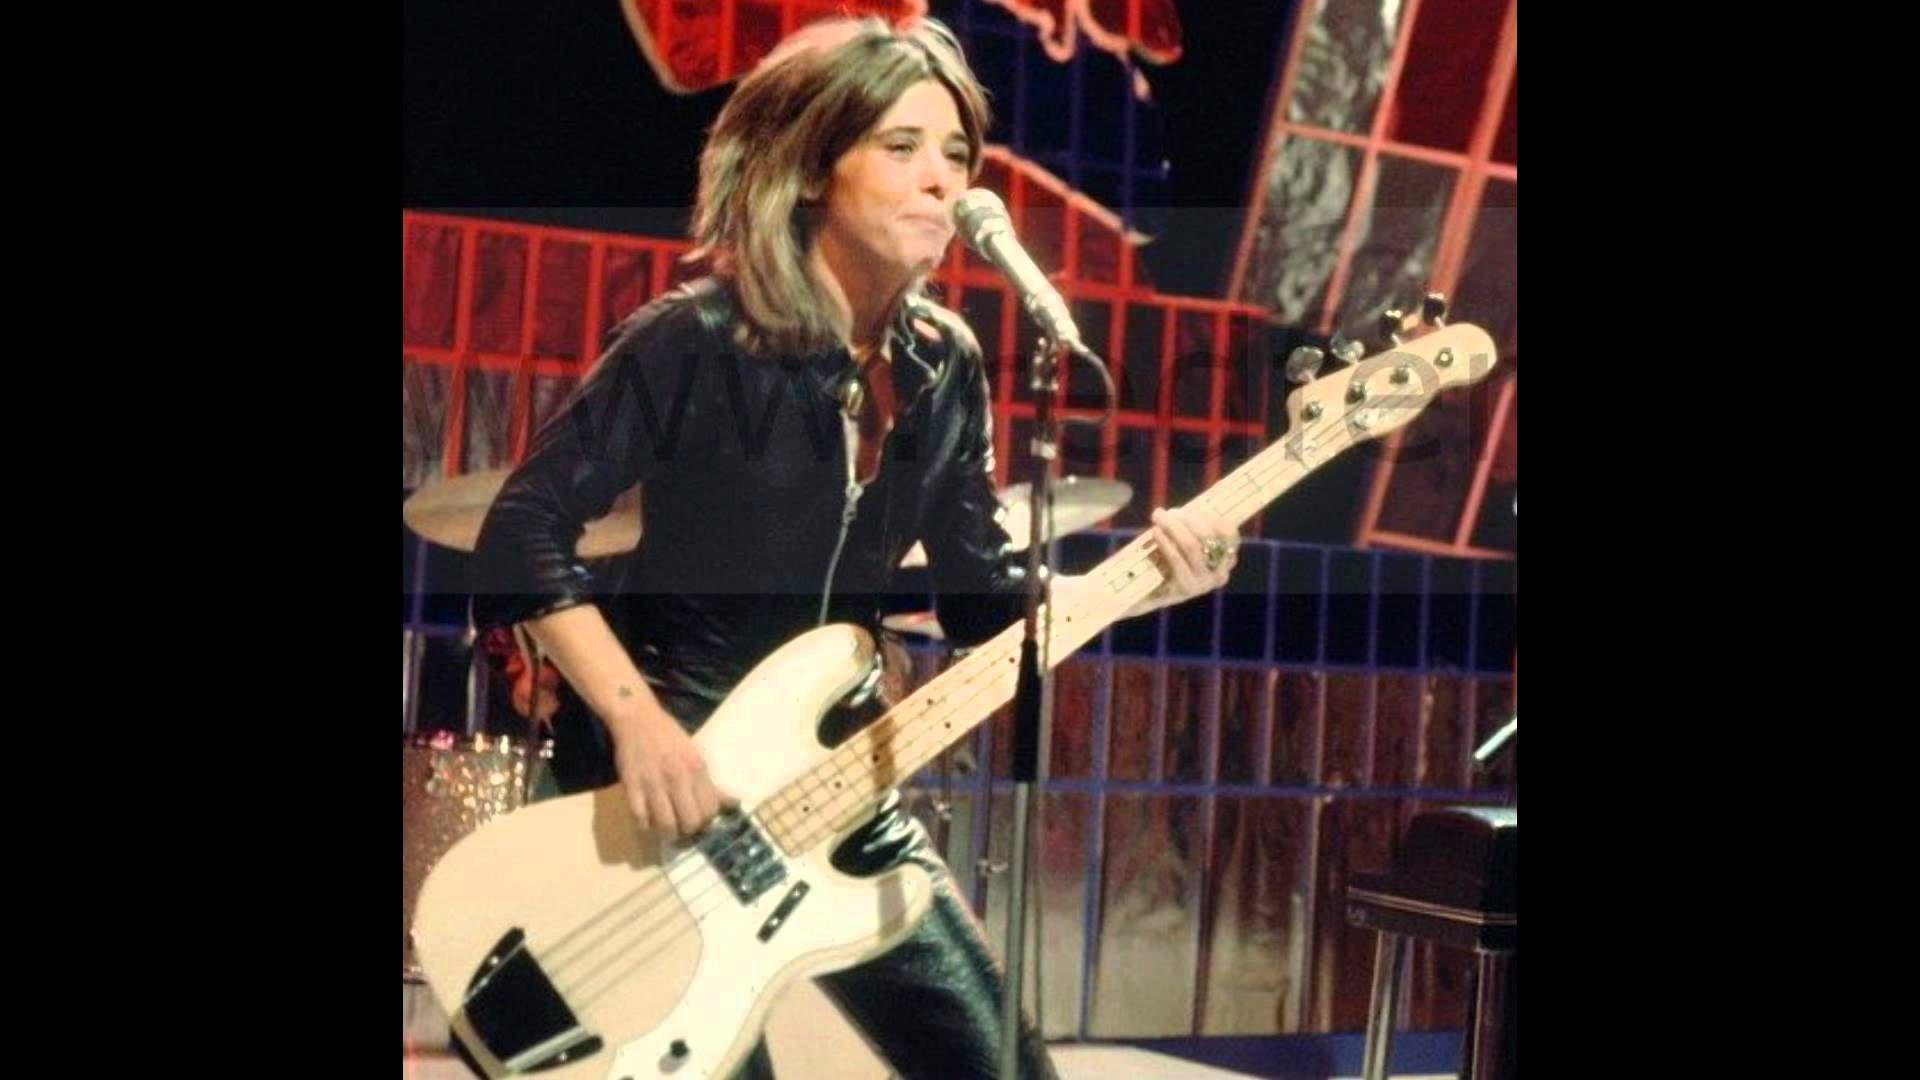 Suzi Quatro - Get back mamma (1973) /Rock Glam/ With Lyrics - YouTube